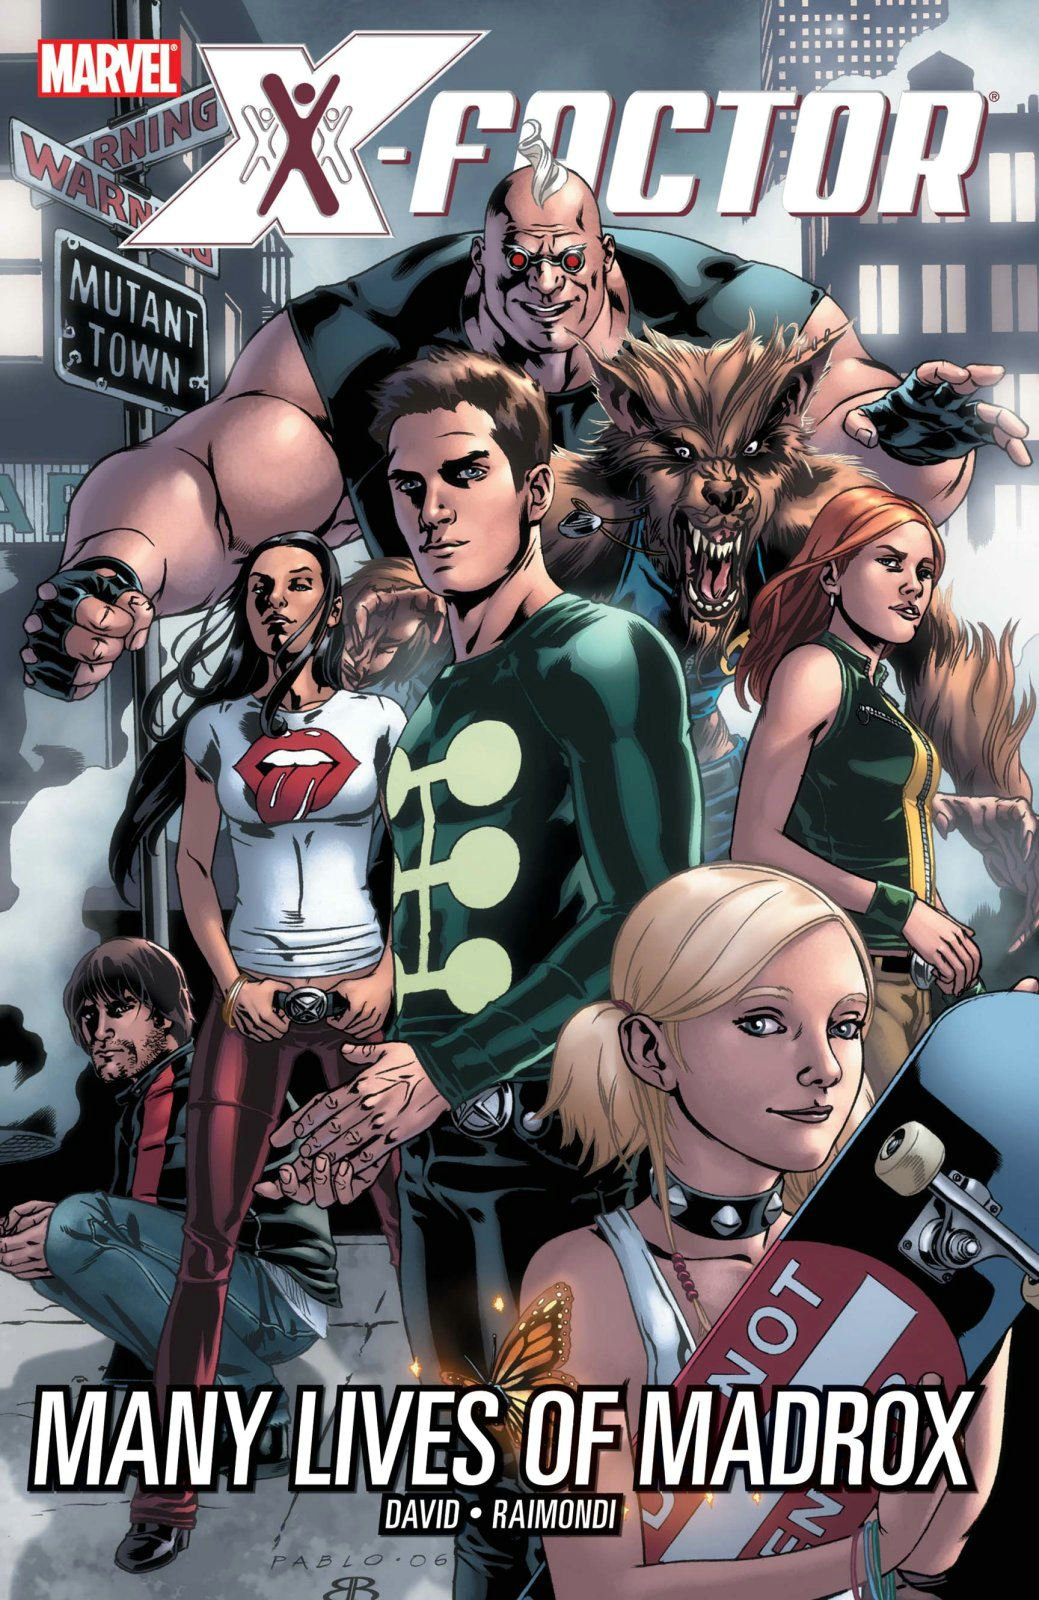 Download X-Factor Vol. 3: Many Lives of Madrox (X-Men) (v. 3) PDF